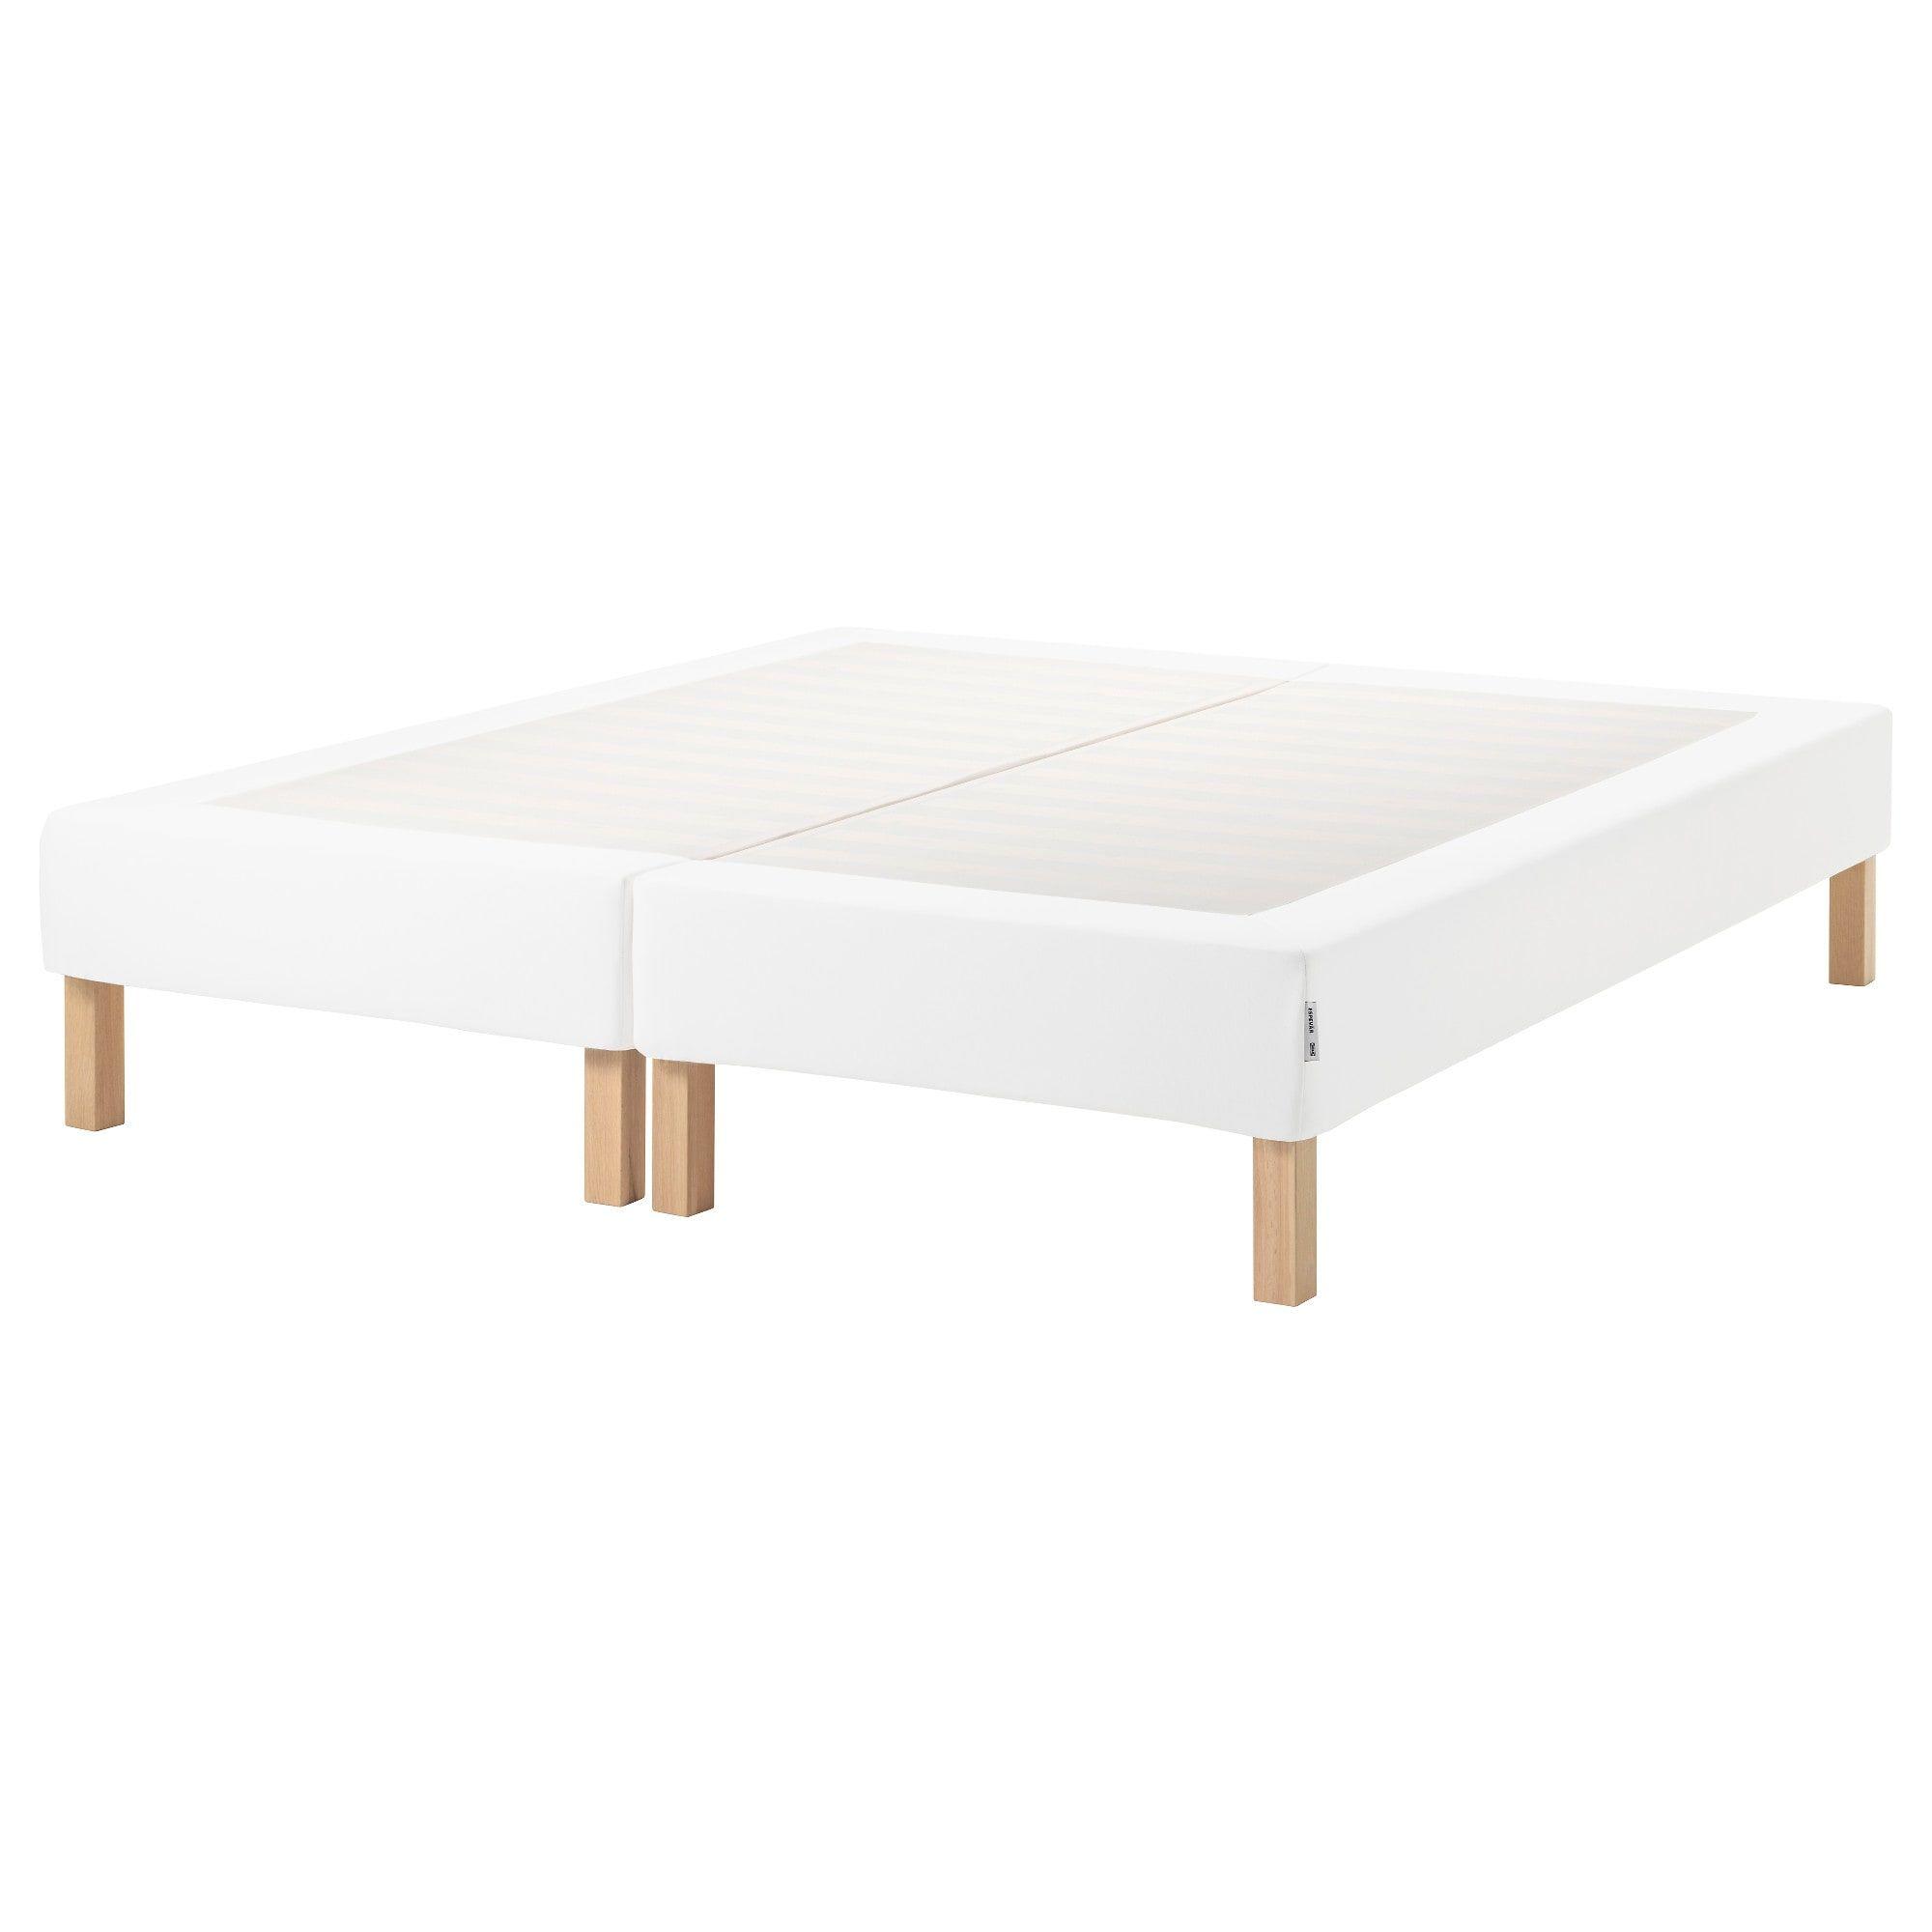 Espevar Sommier A Lattes Avec Pieds Blanc 160x200 Cm Bettgestell Lattenrost Ikea